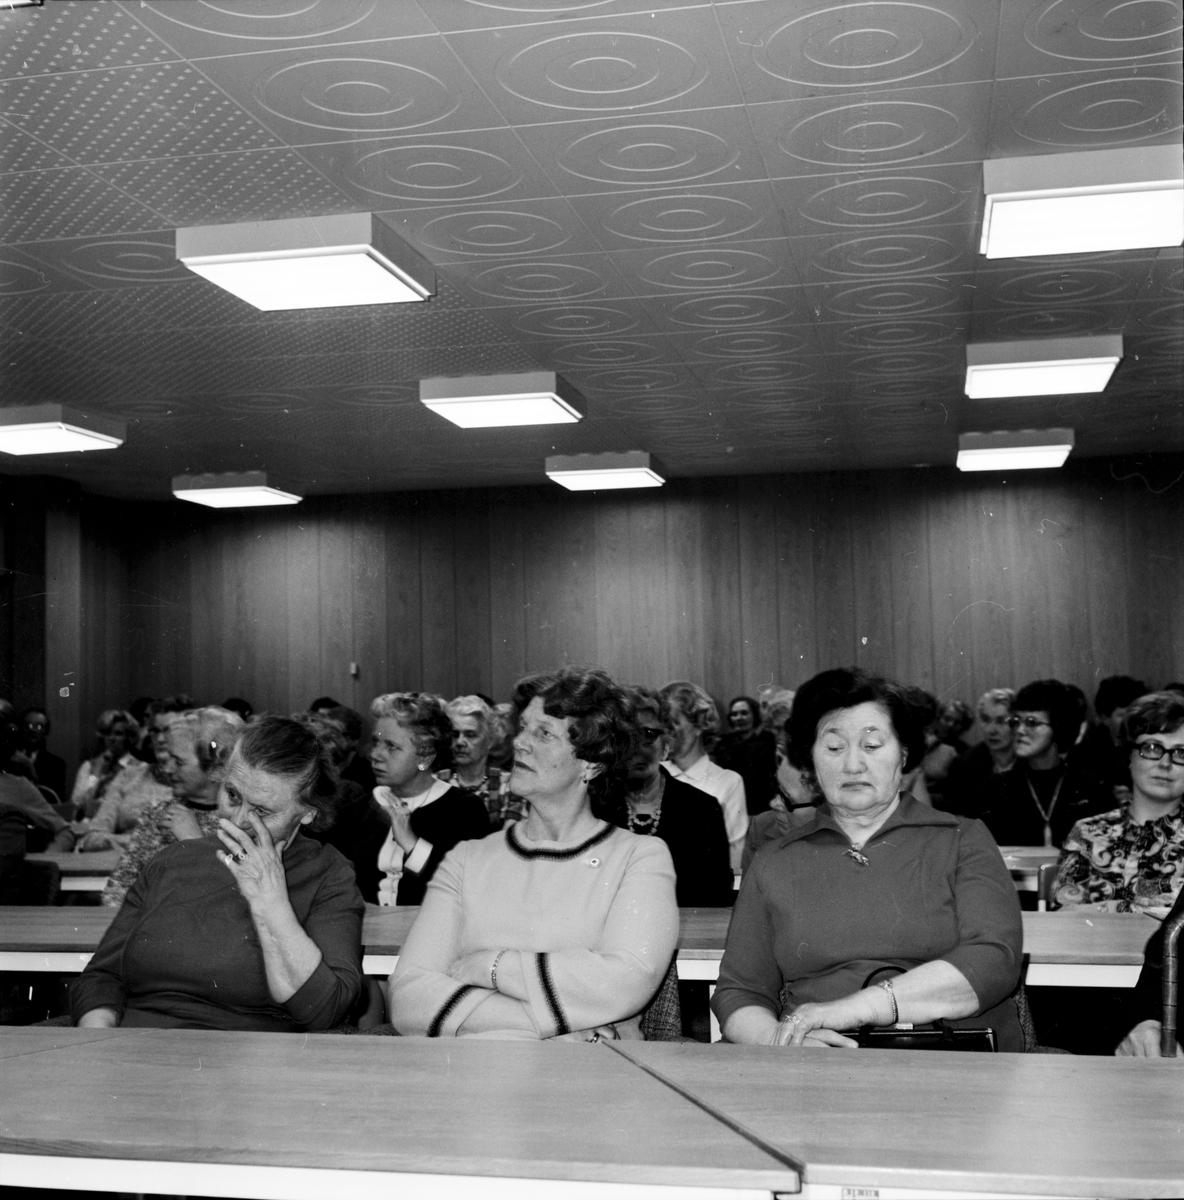 Arbrå, R.K. Årsmöte, April 1971